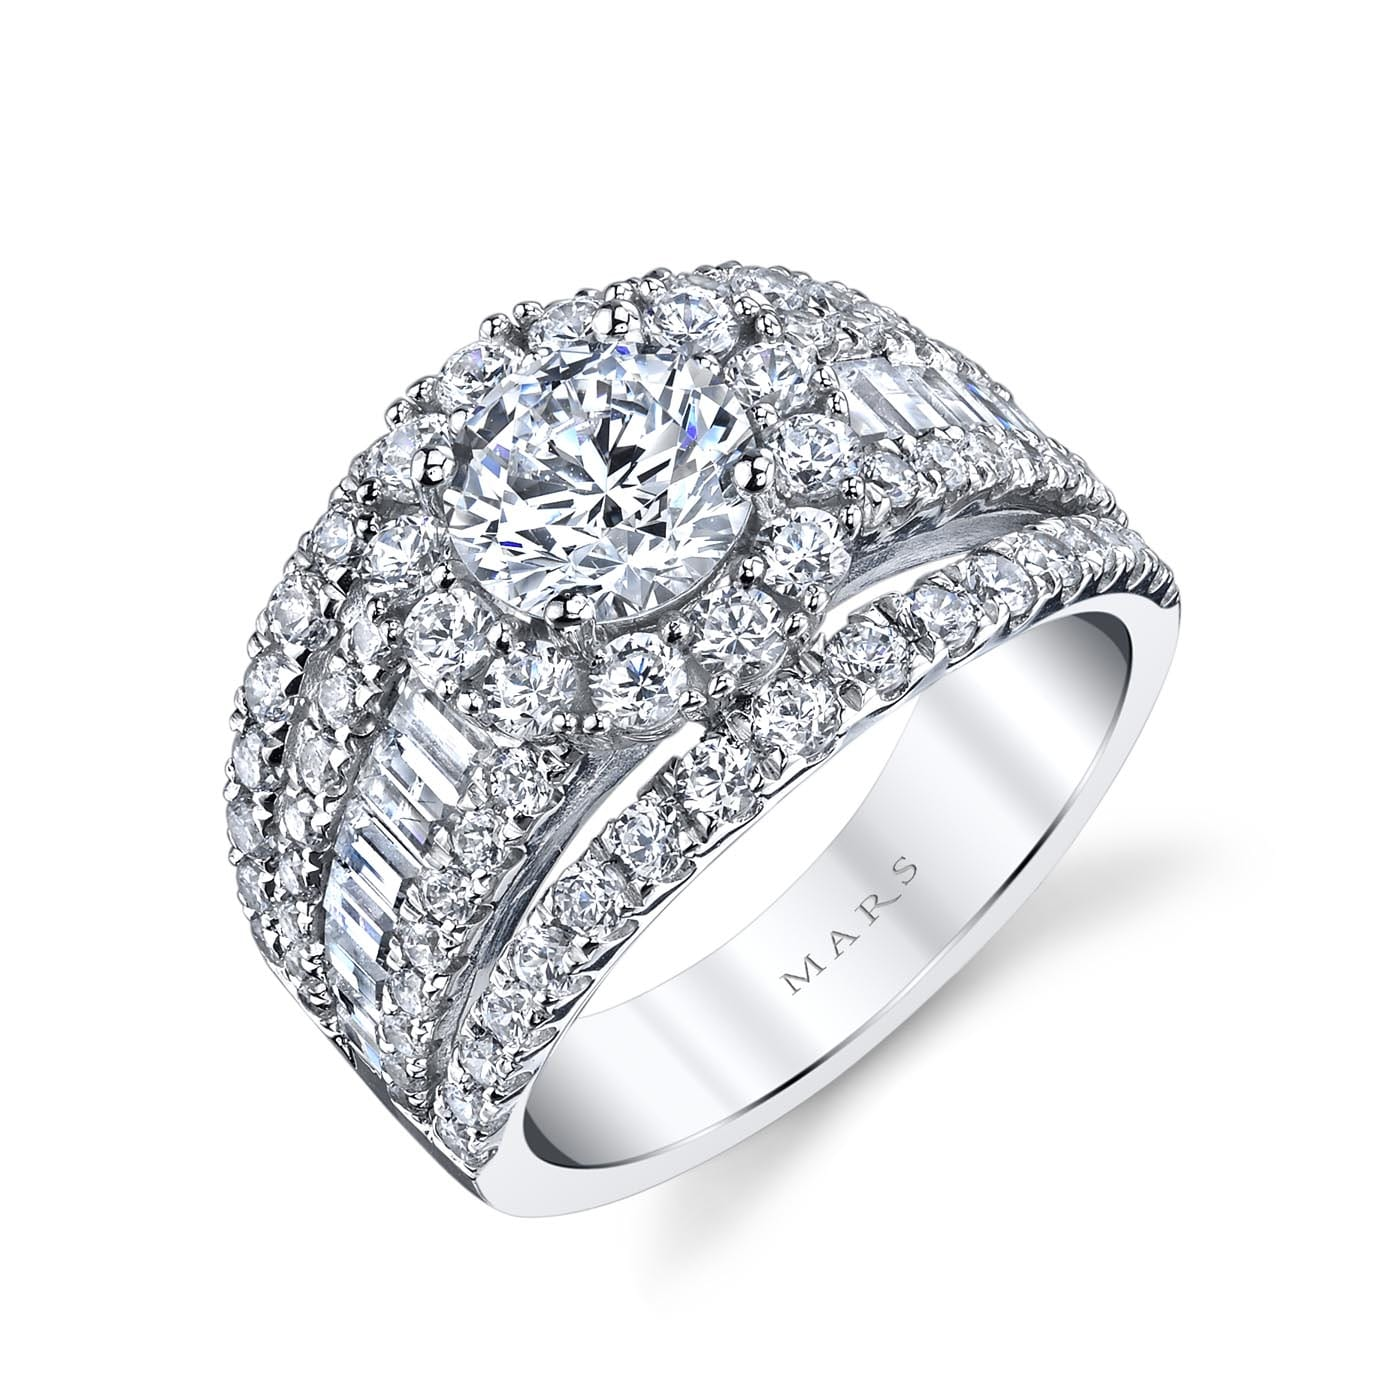 Halo Engagement RingStyle #: MARS 25625